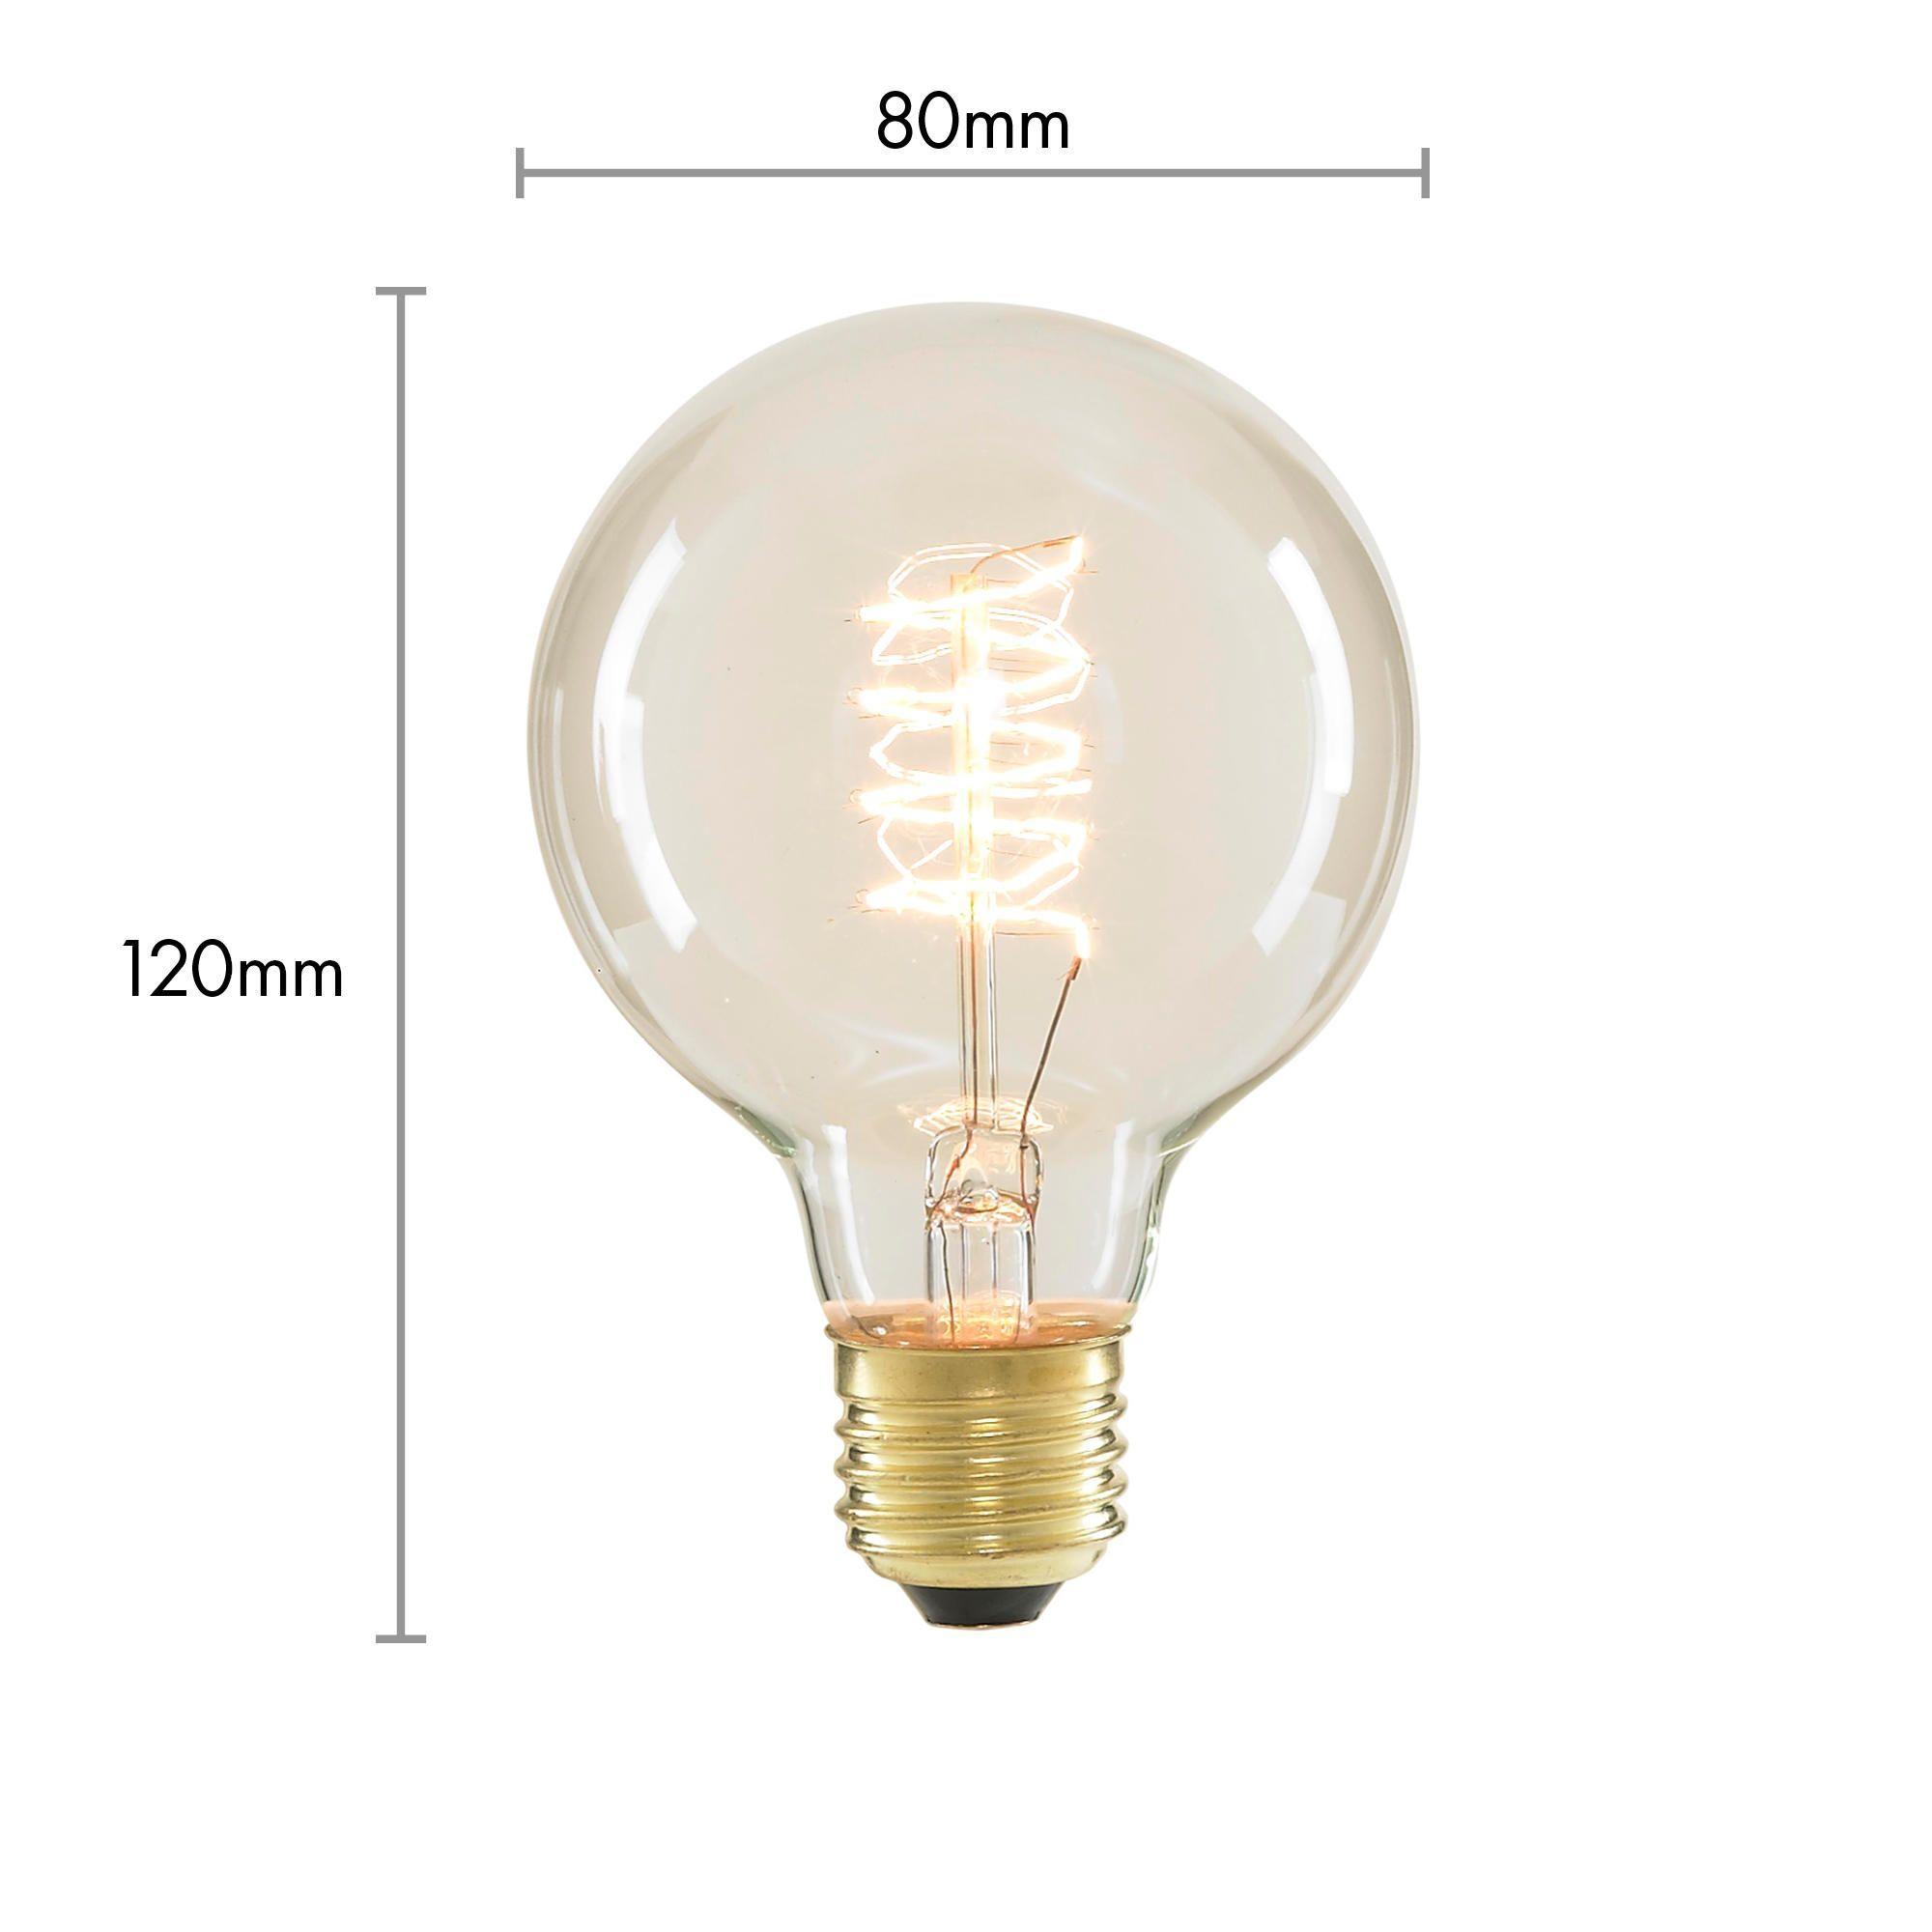 40 Watt Vintage Light Bulb Globe E27 Spiral Filament Clear